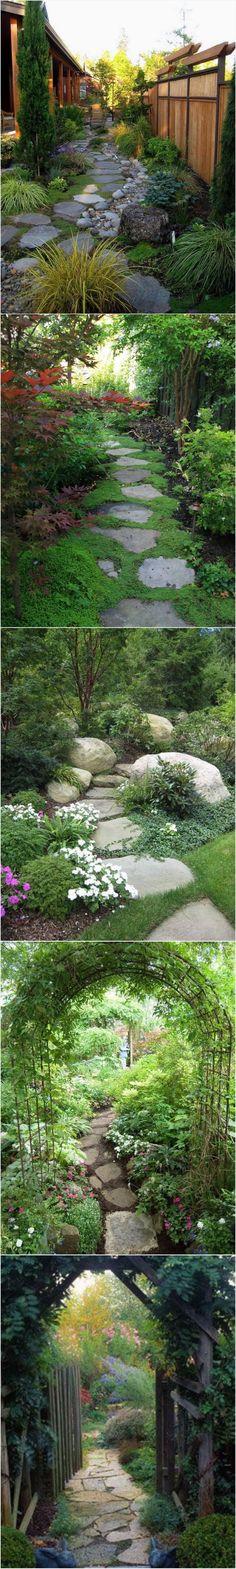 Garden Pathway Ideas and Inspiration ~ ღ Skuwandi